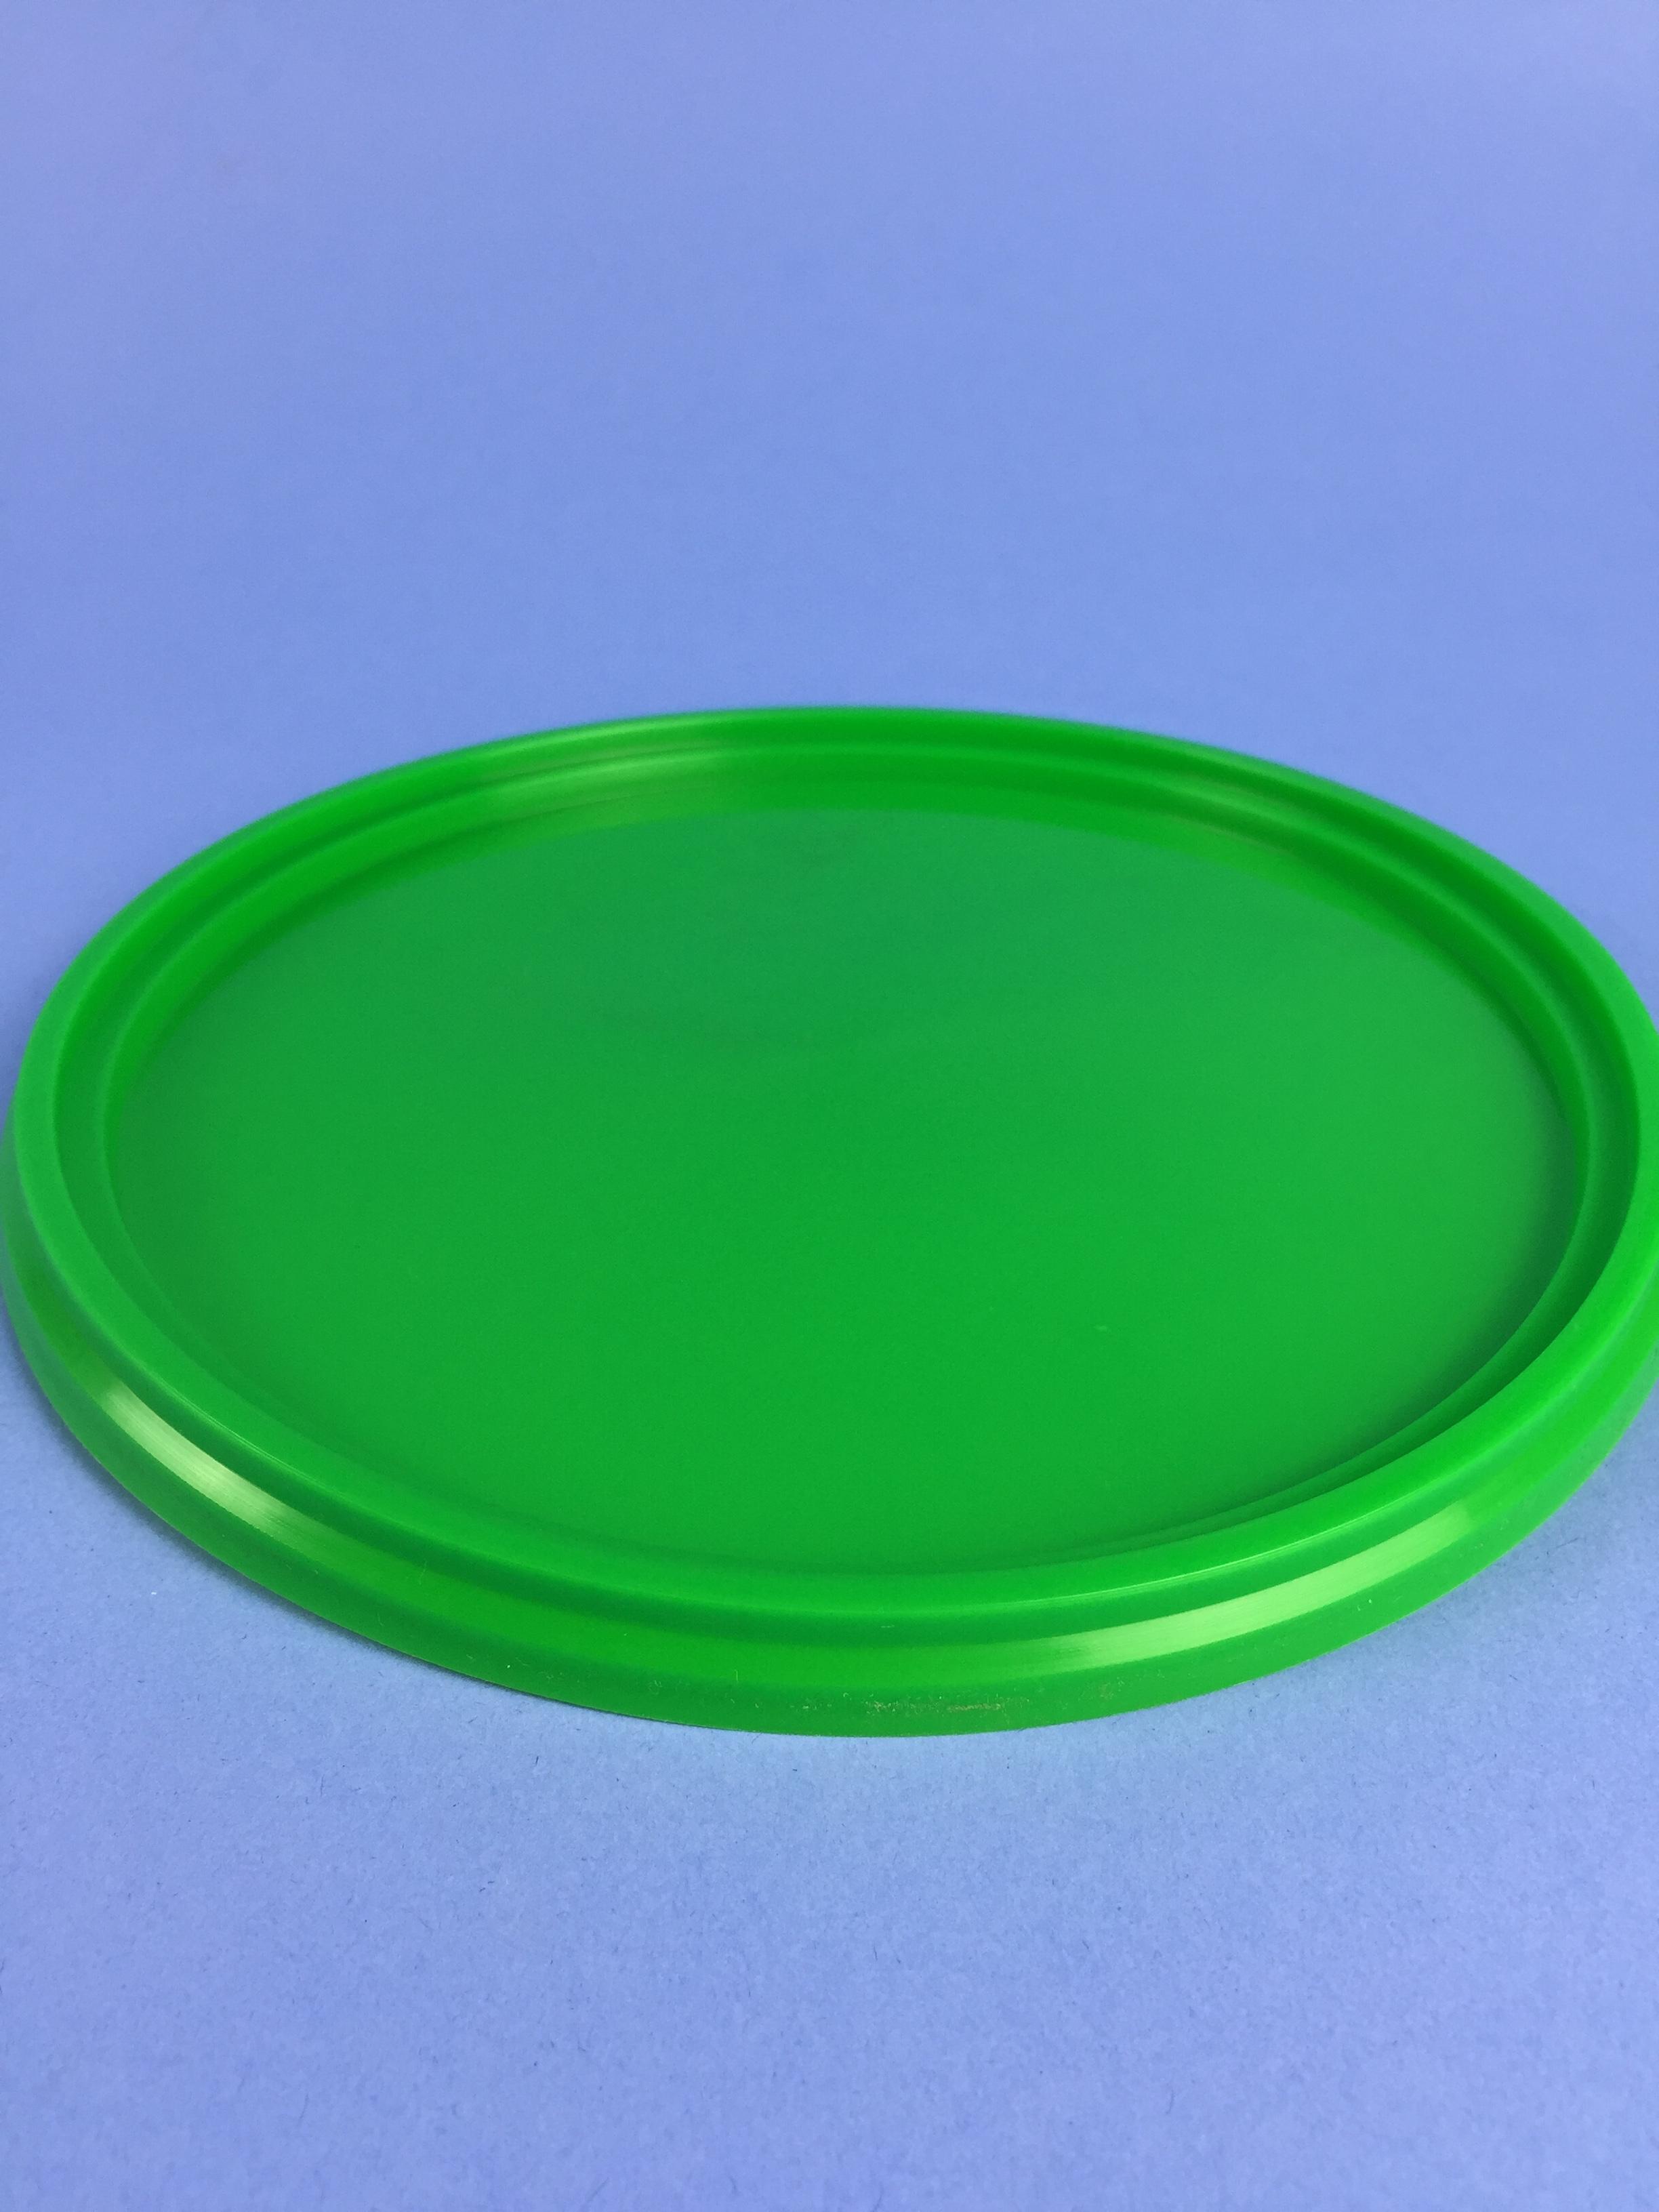 Black 3 Litre Bucket C W Plastic Handle Amp Tamper Evident